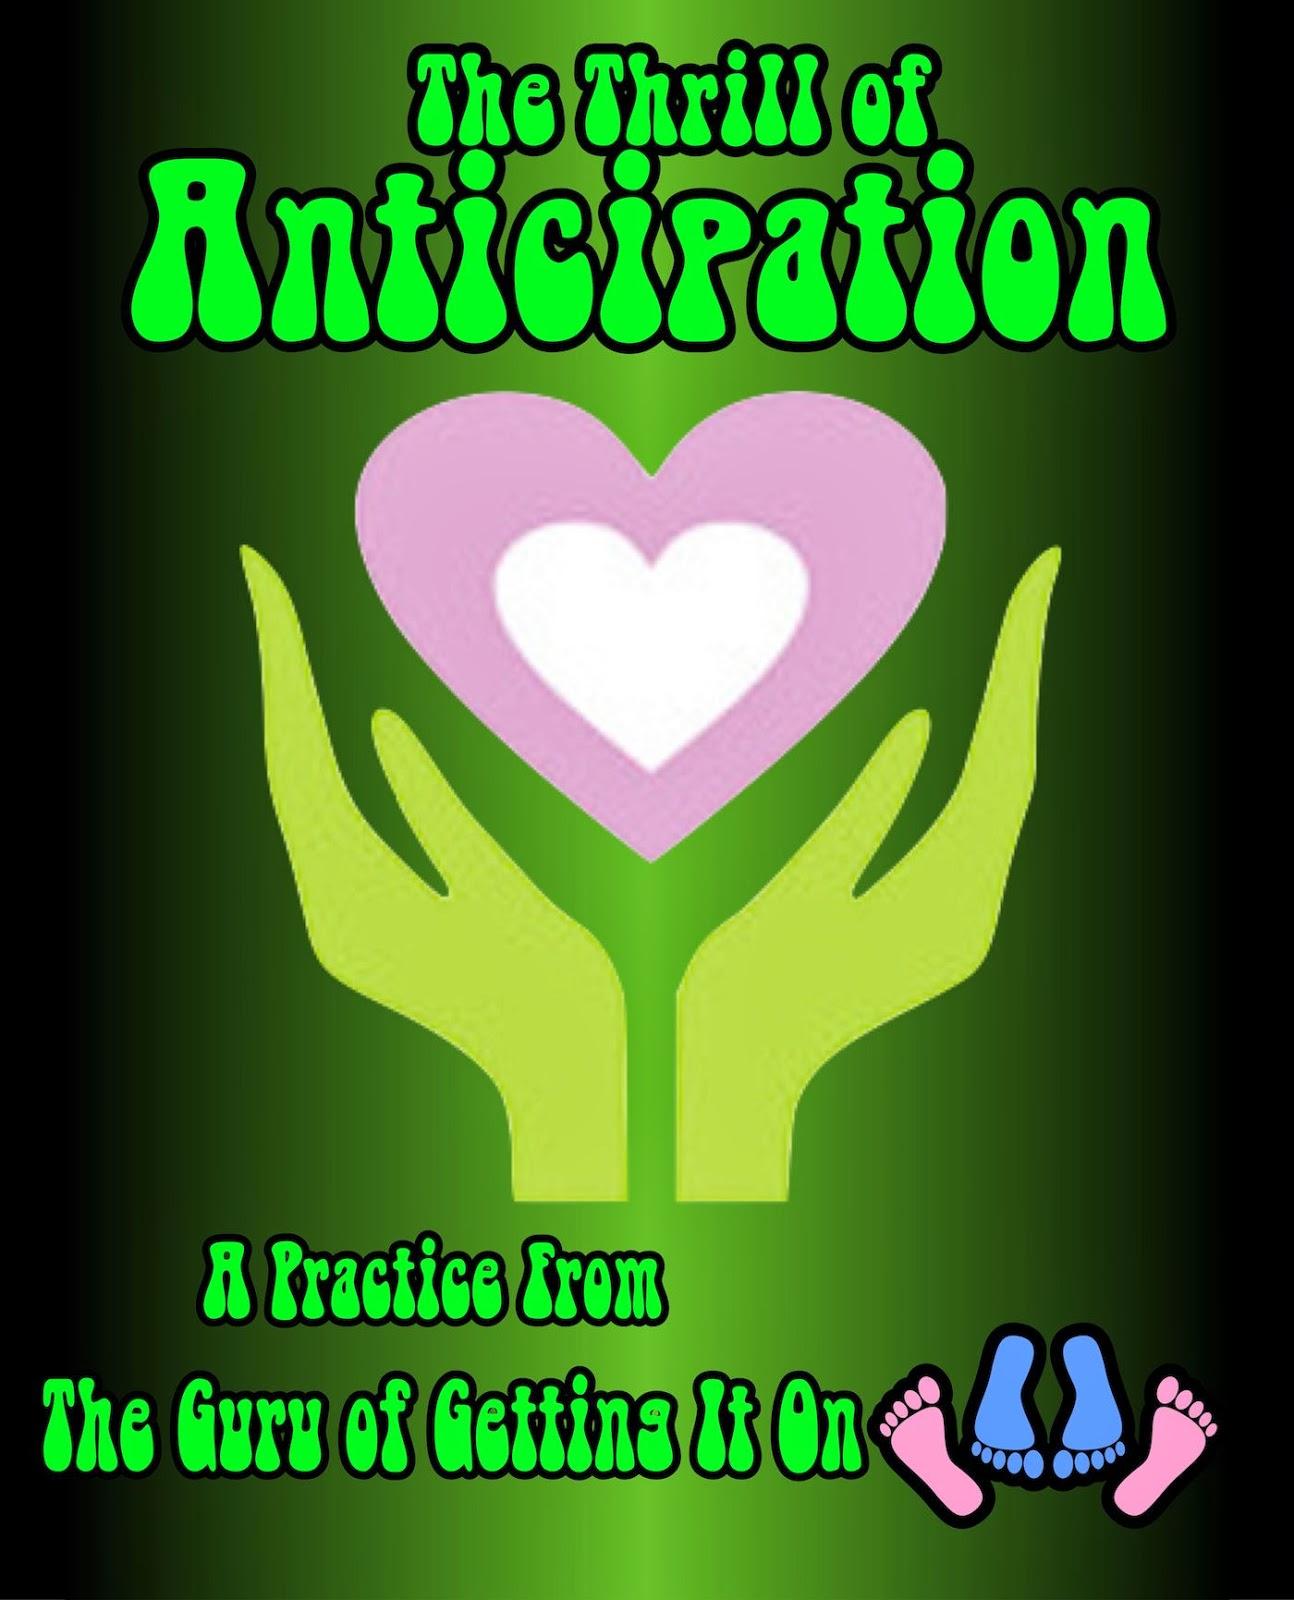 http://www.amazon.com/The-Thrill-Anticipation-Practices-Getting-ebook/dp/B00HZWDE6I/ref=sr_1_3?ie=UTF8&qid=1392404255&sr=8-3&keywords=the+guru+of+getting+It+on